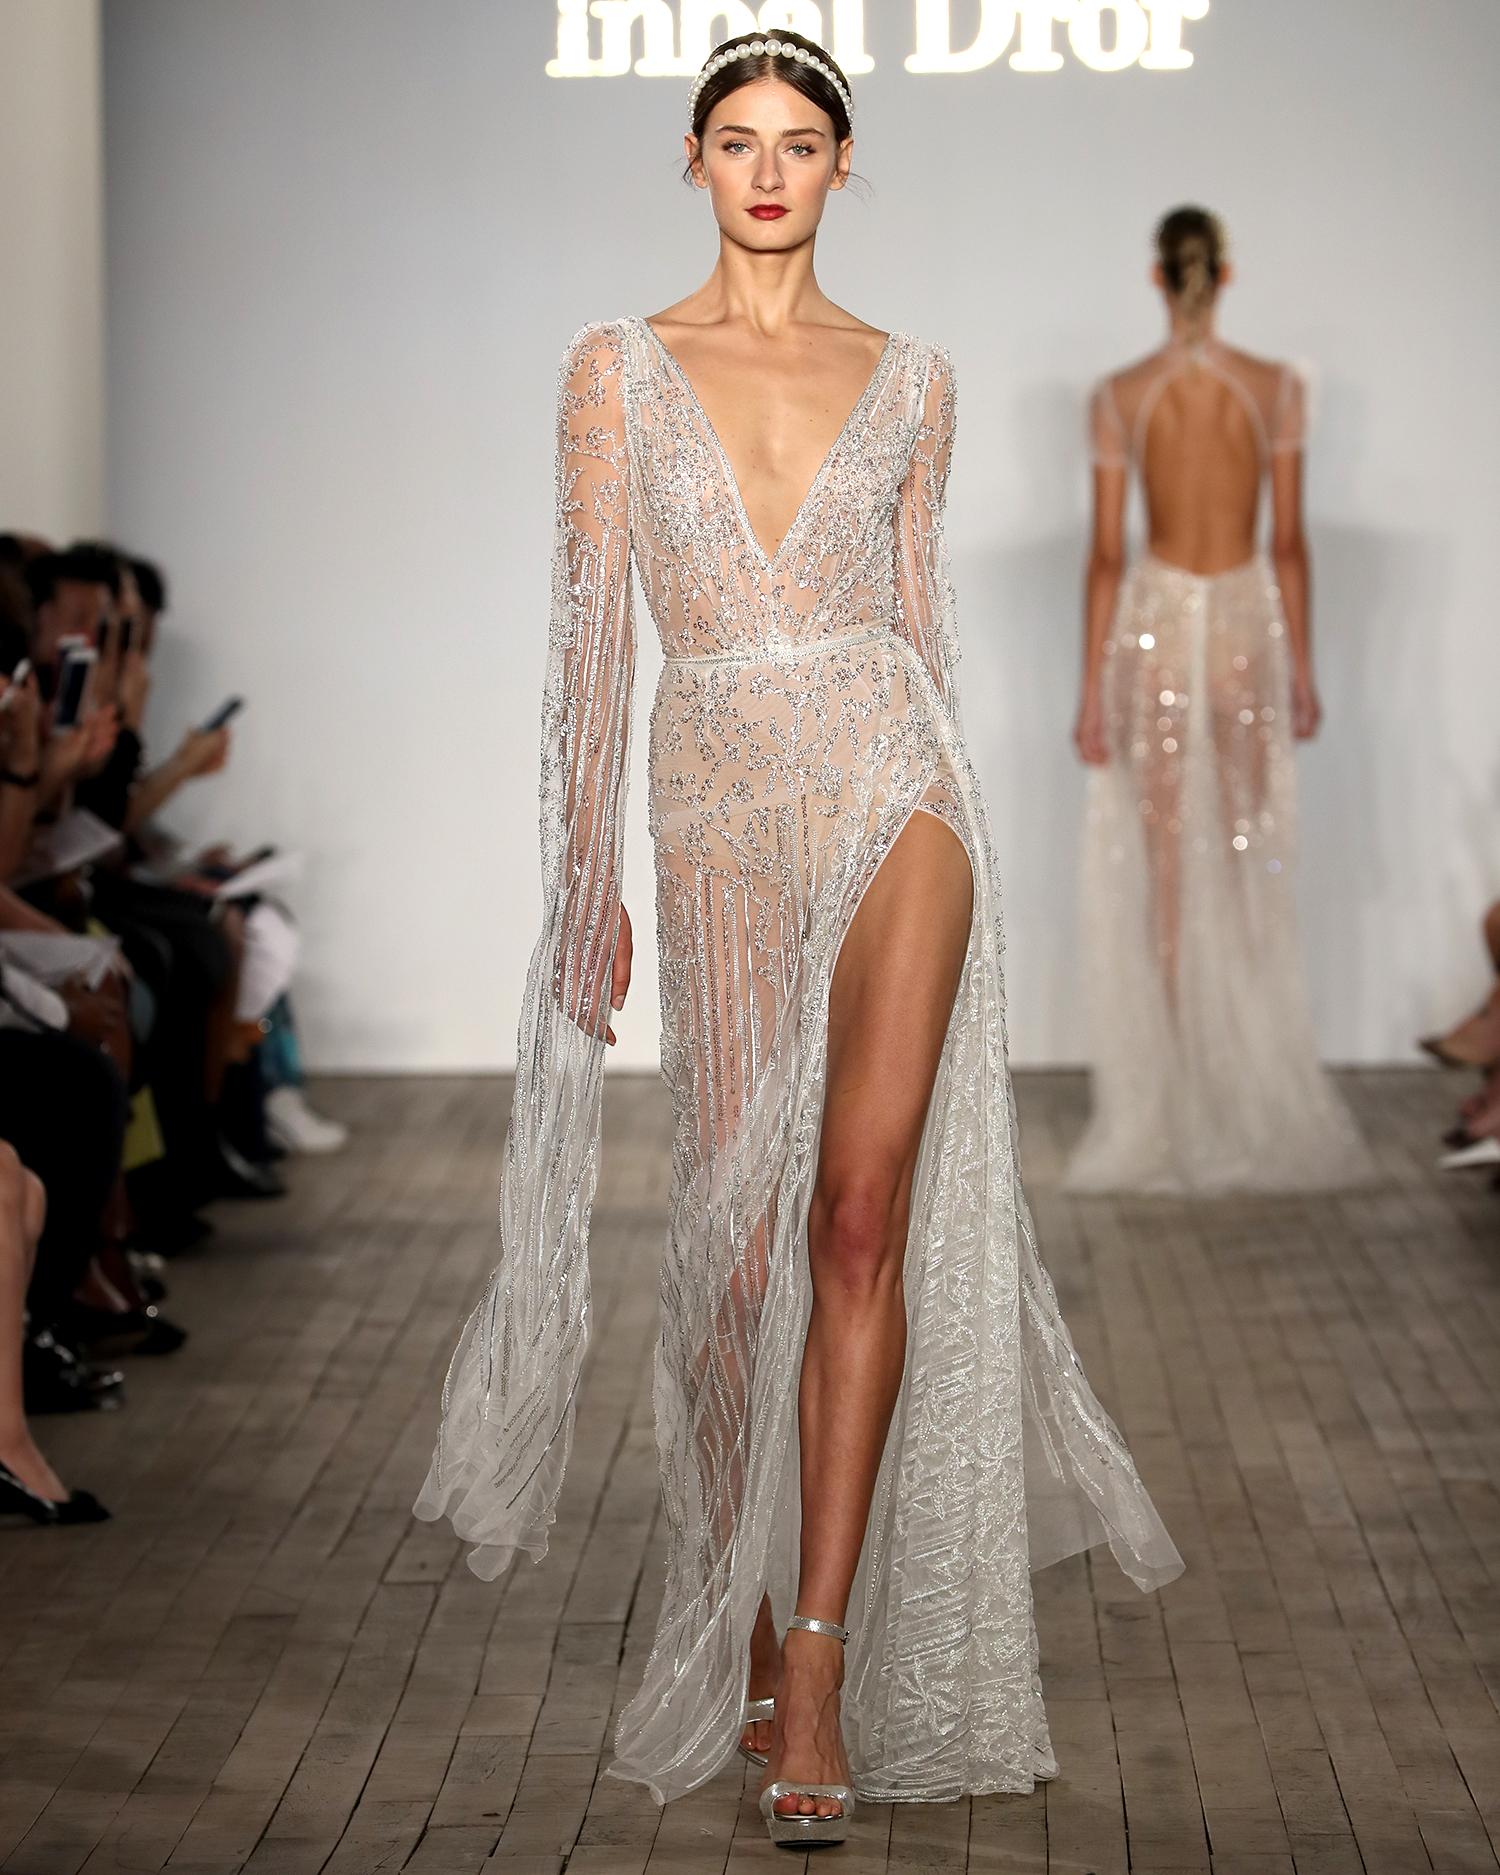 inbal dror wedding dress sheer beaded sheath with high slit